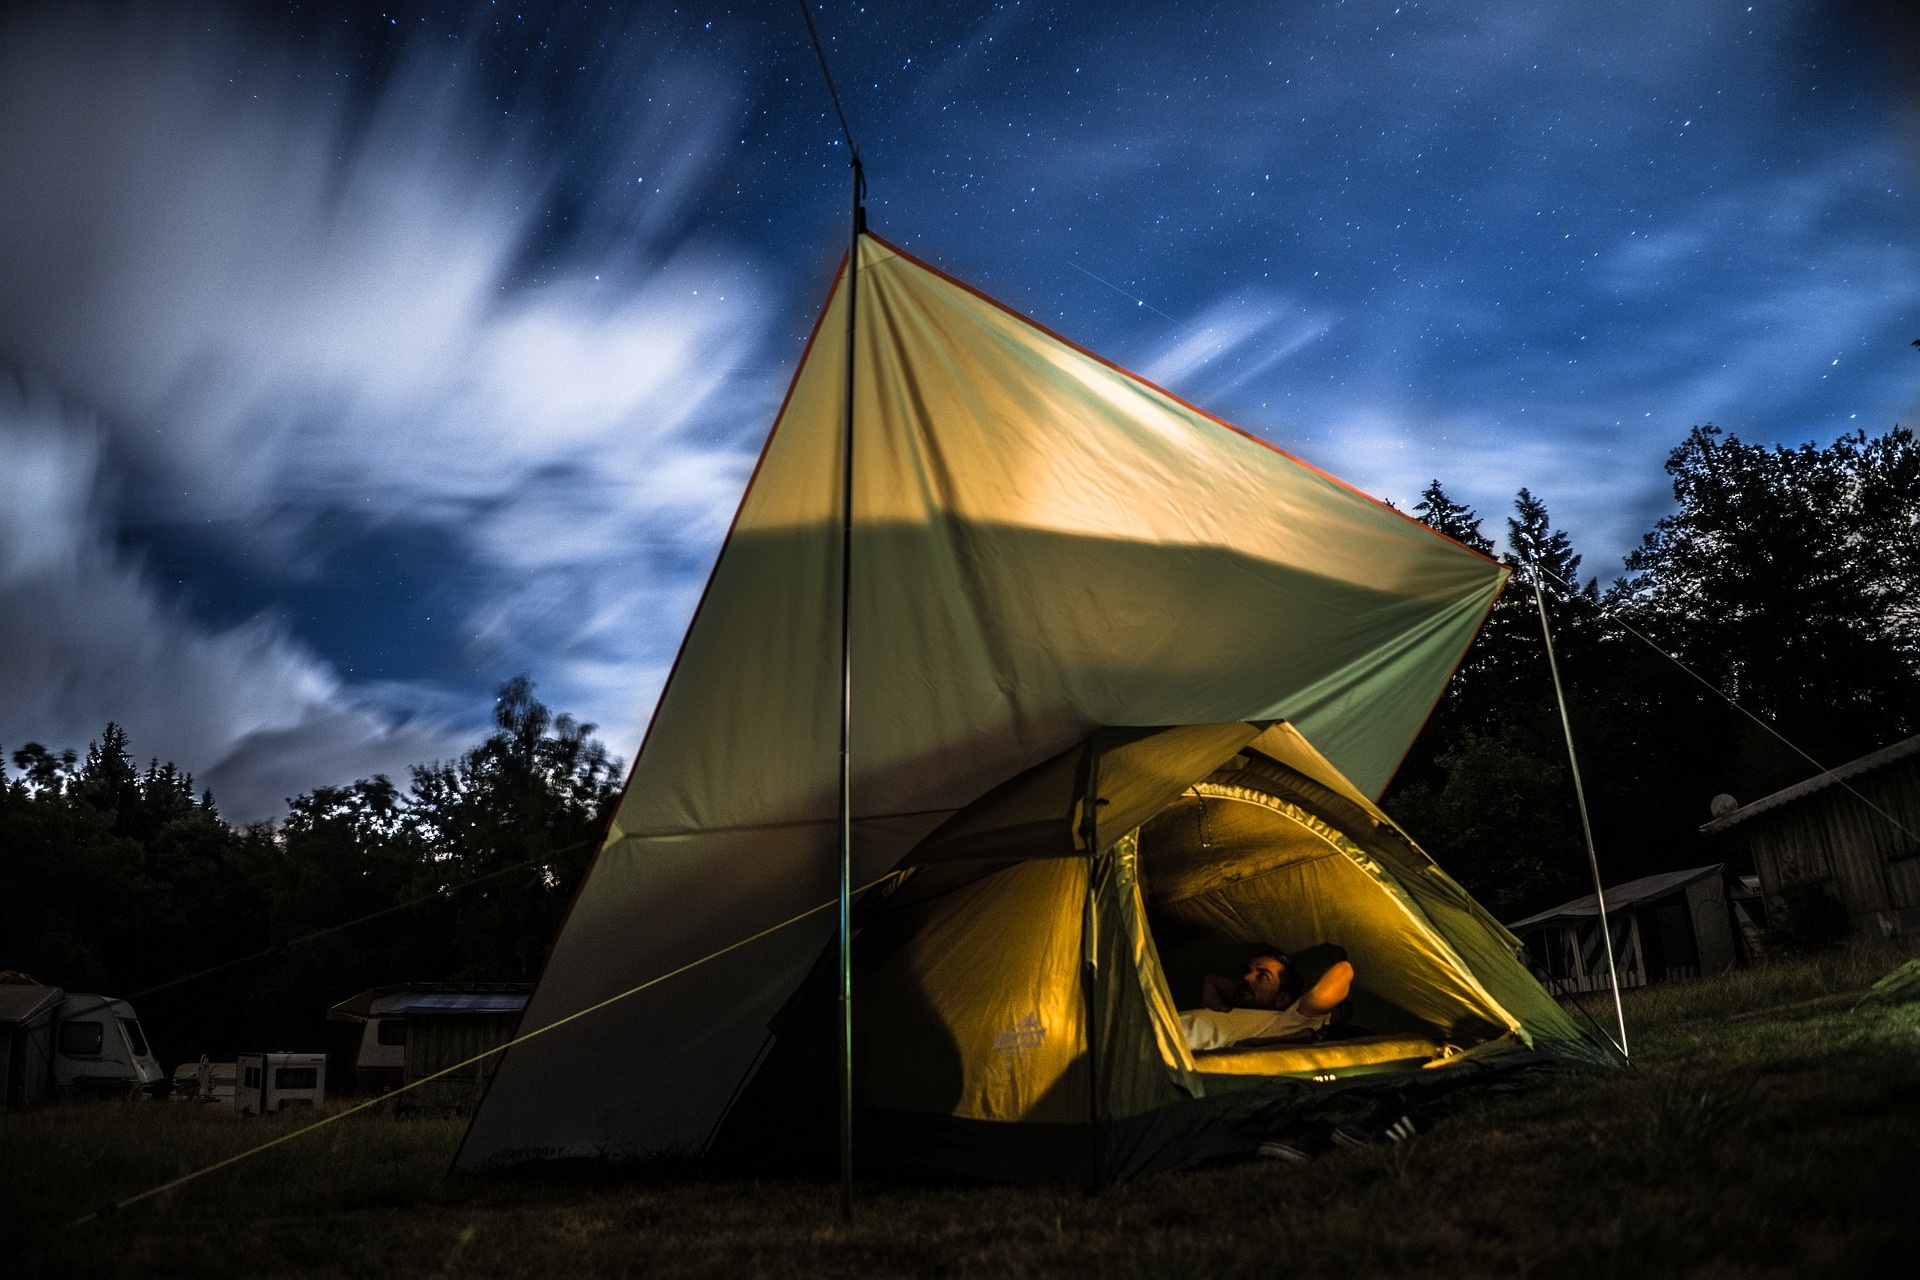 lightweight-tent-fabric-camping-fabric-canvas-etc